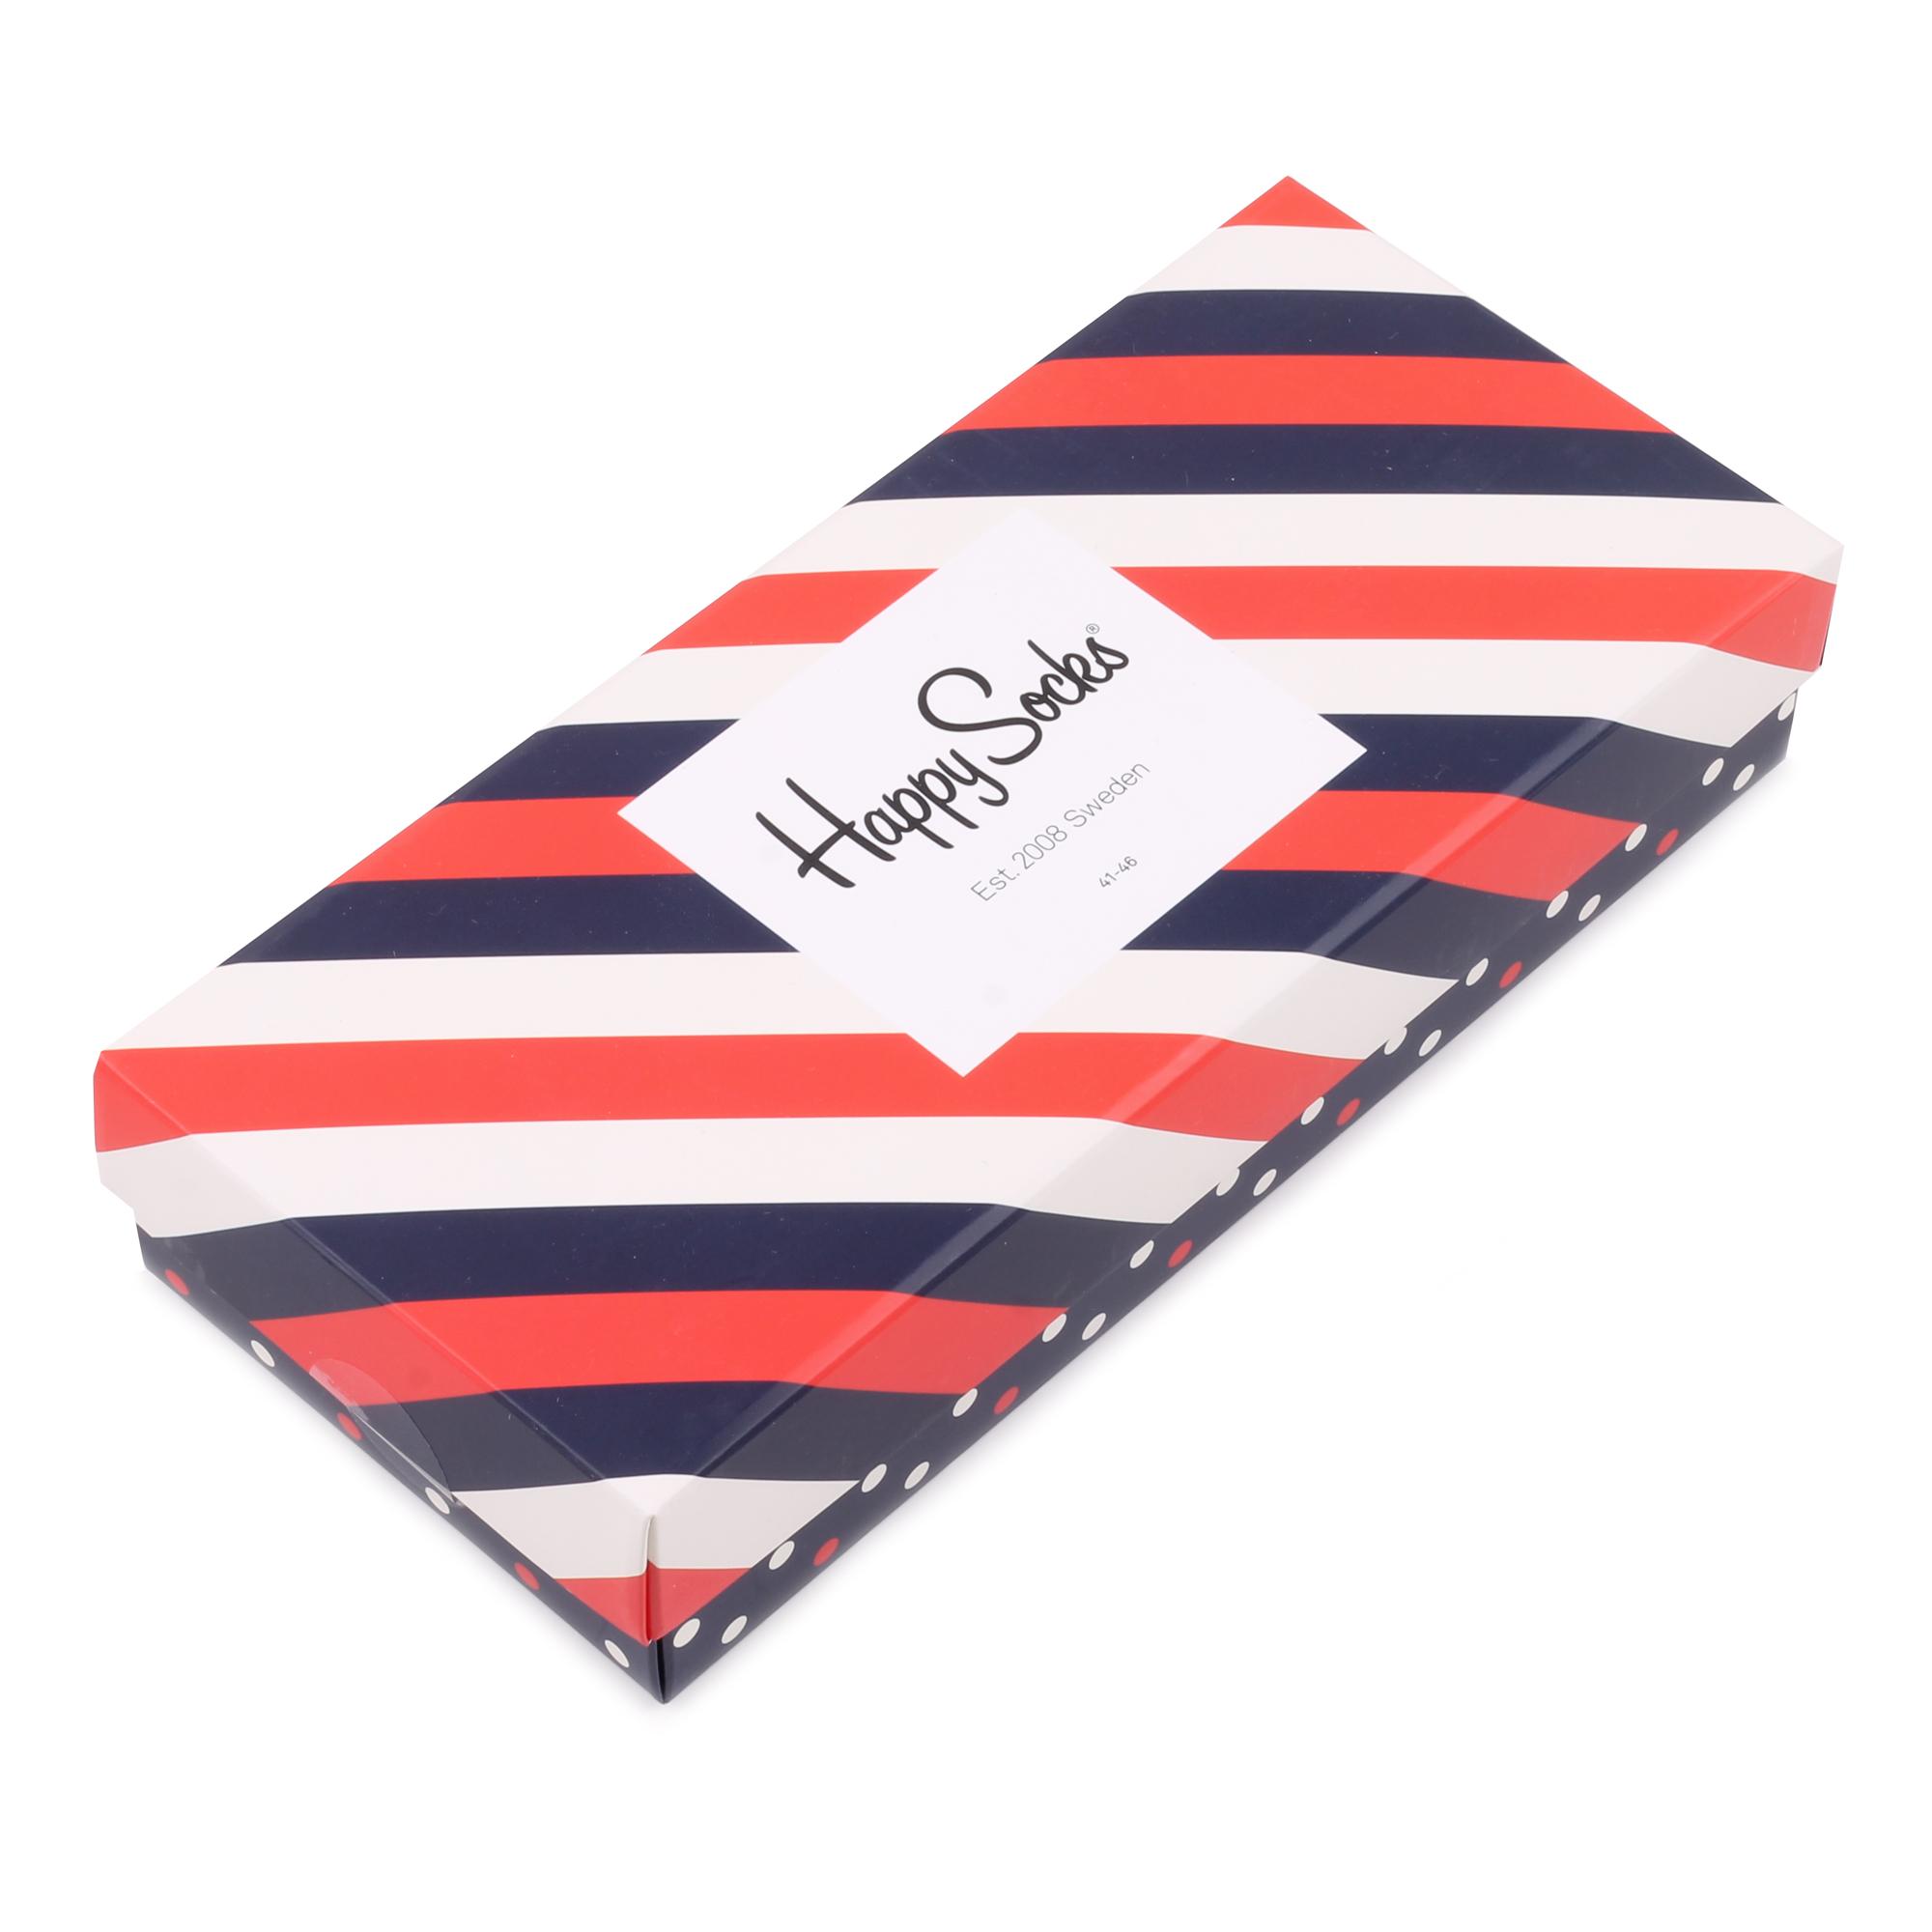 Носки унисекс Happy Socks 4 пары носков-Stripe Filled Optic разноцветные 36-40 RU